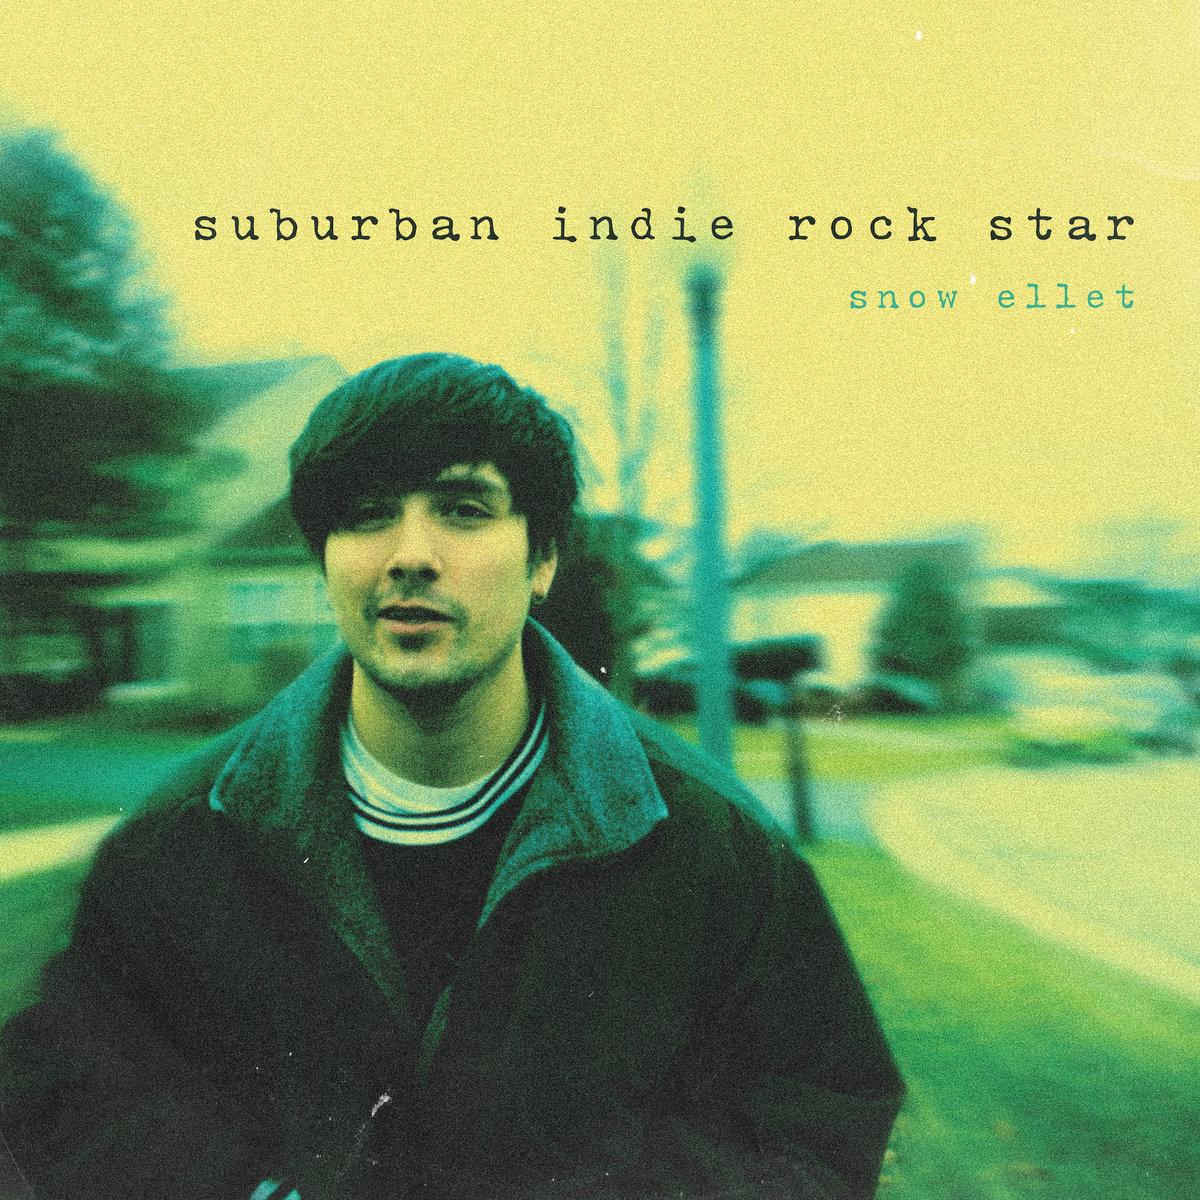 suburban indie rock star | snow ellet